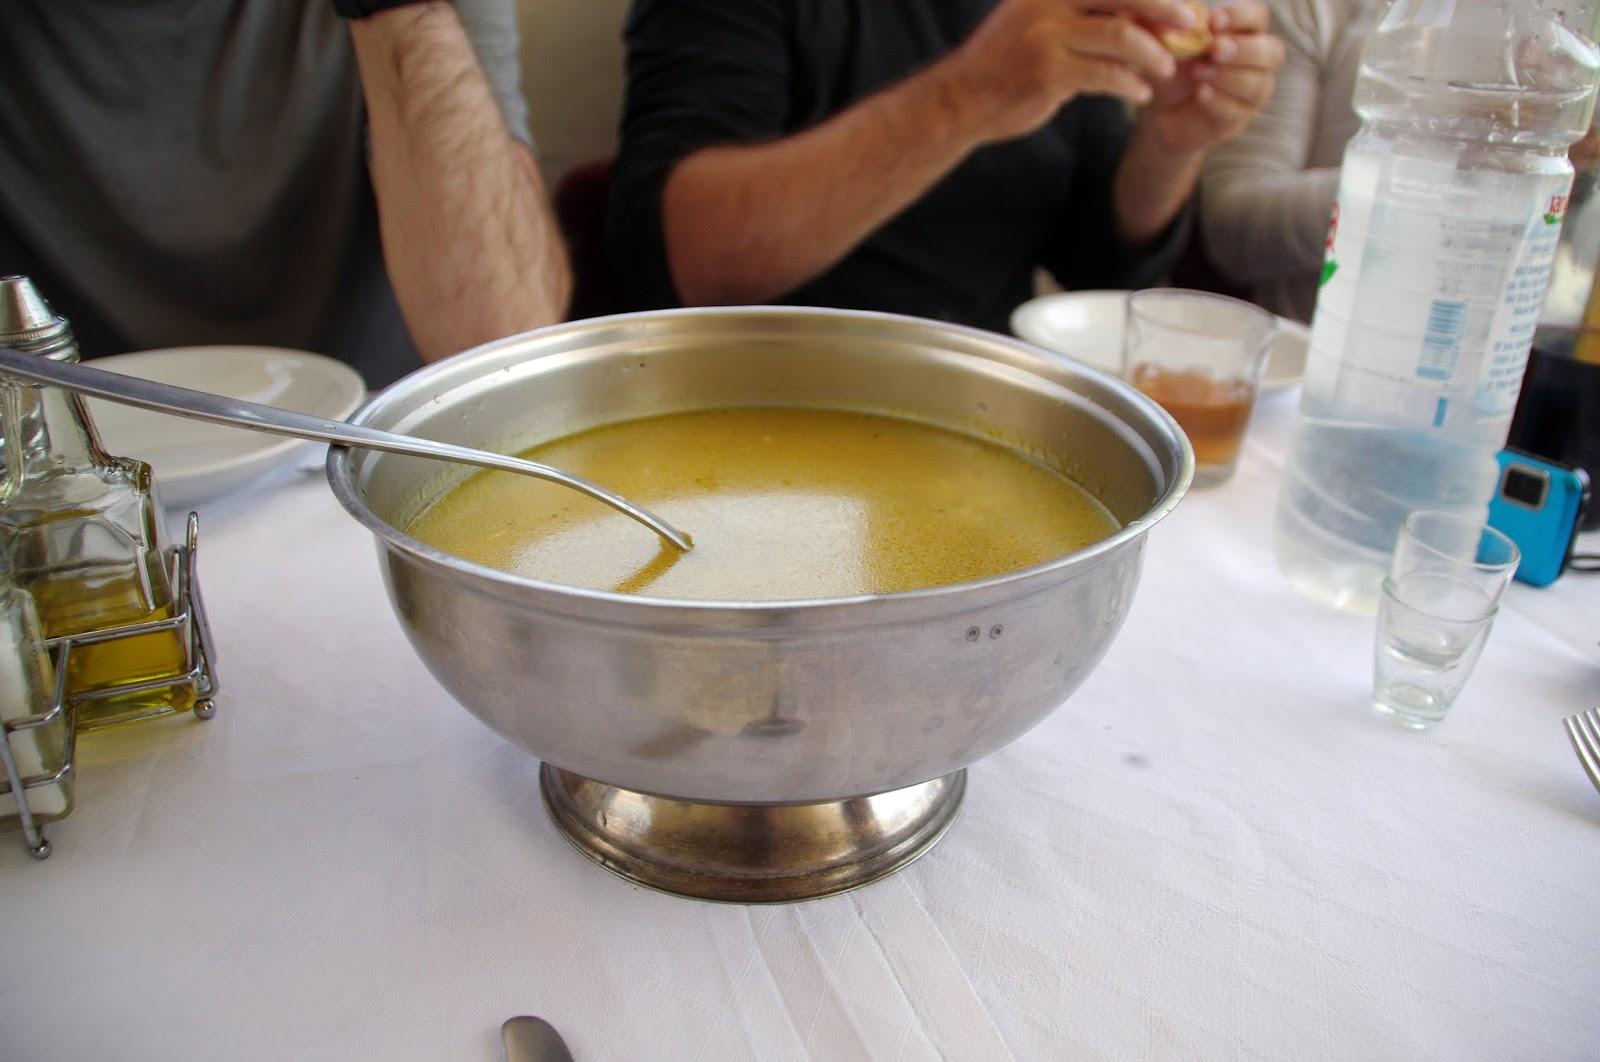 Croatian soup lunch